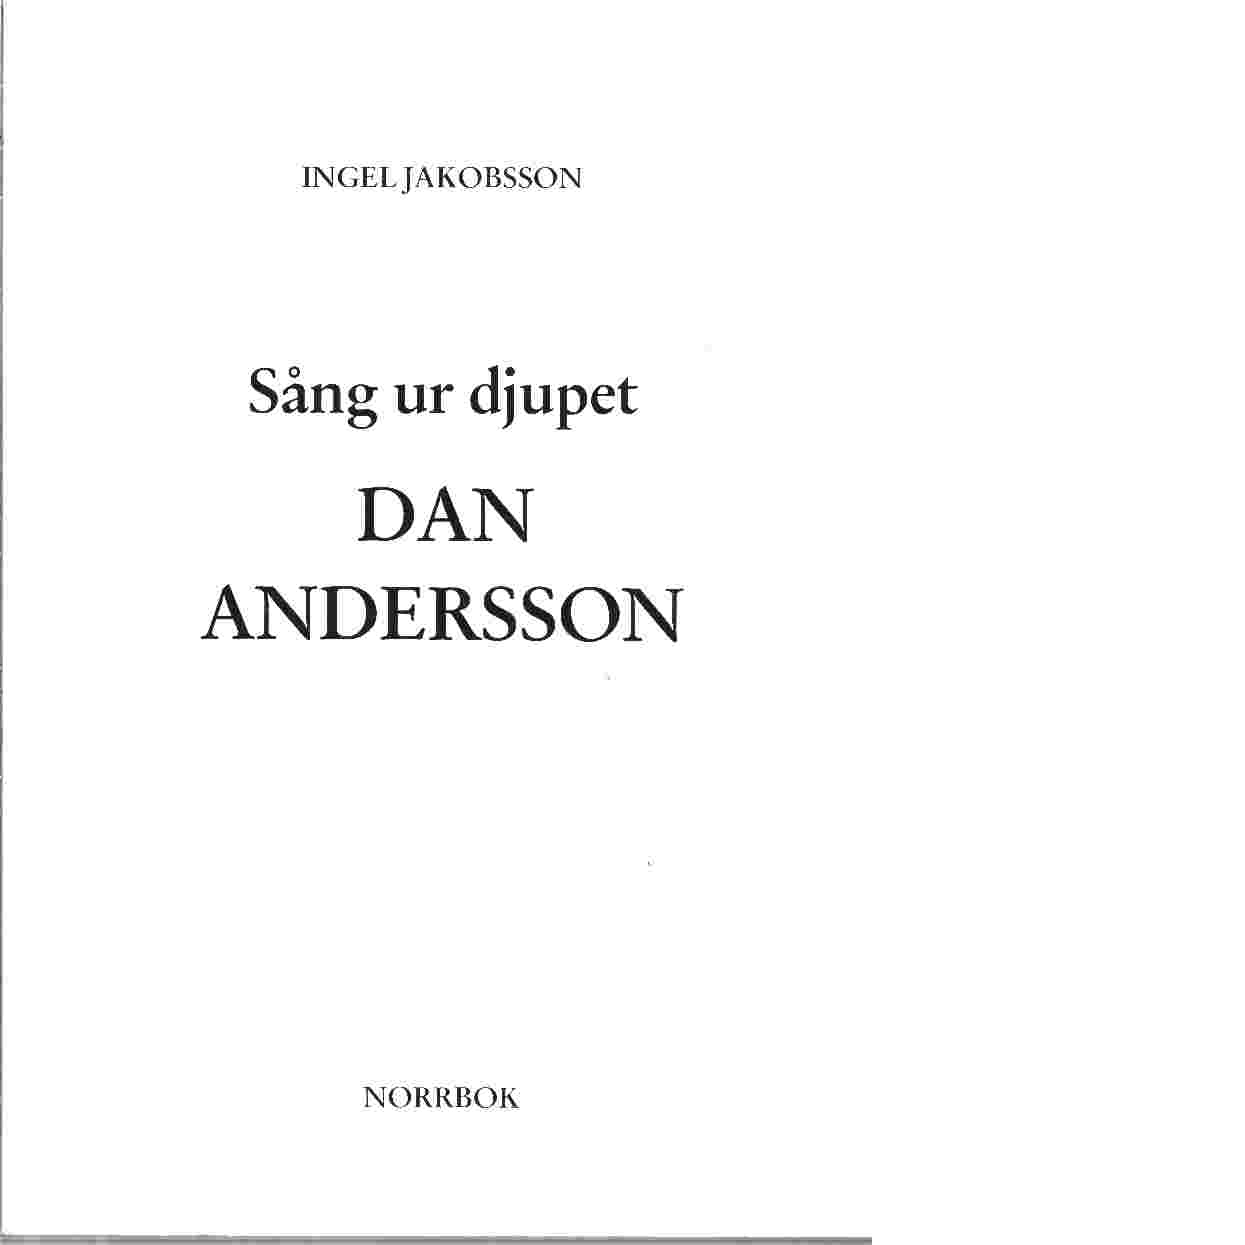 Sång ur djupet - Dan Andersson - Jakobsson, Ingel